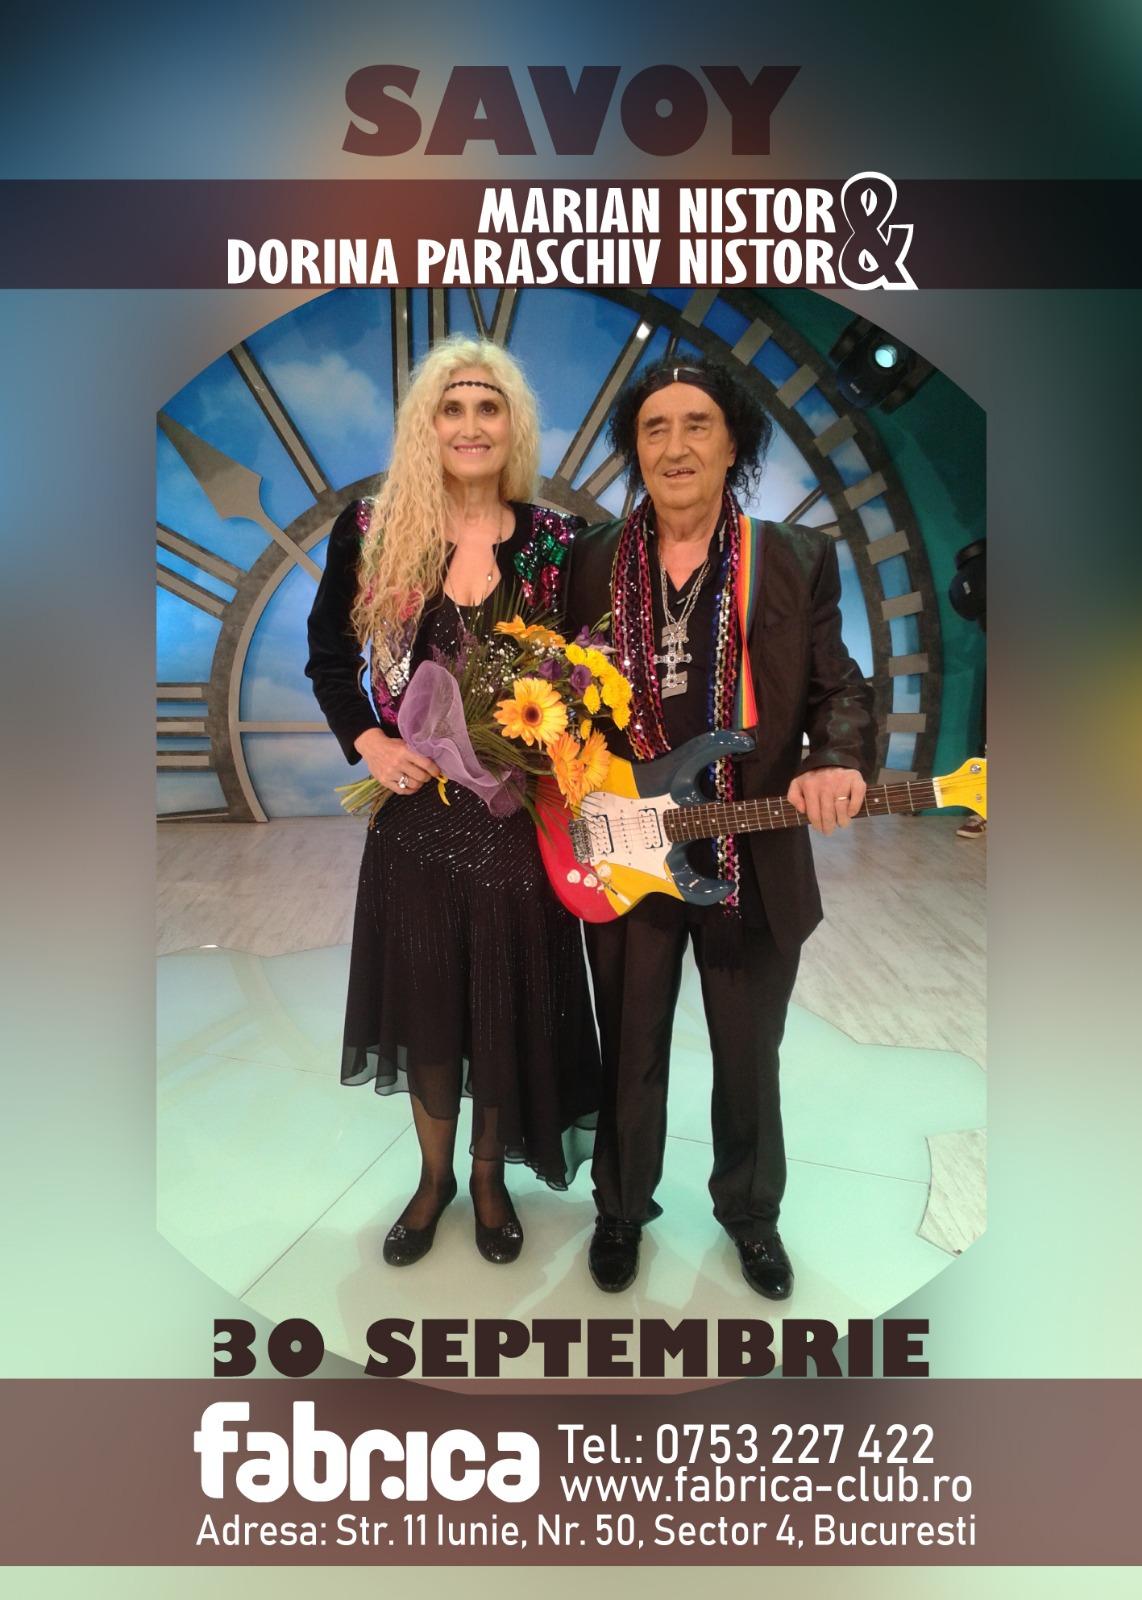 Savoy - Marian Nistor si Dorina Paraschiv Nistor live in Fabrica